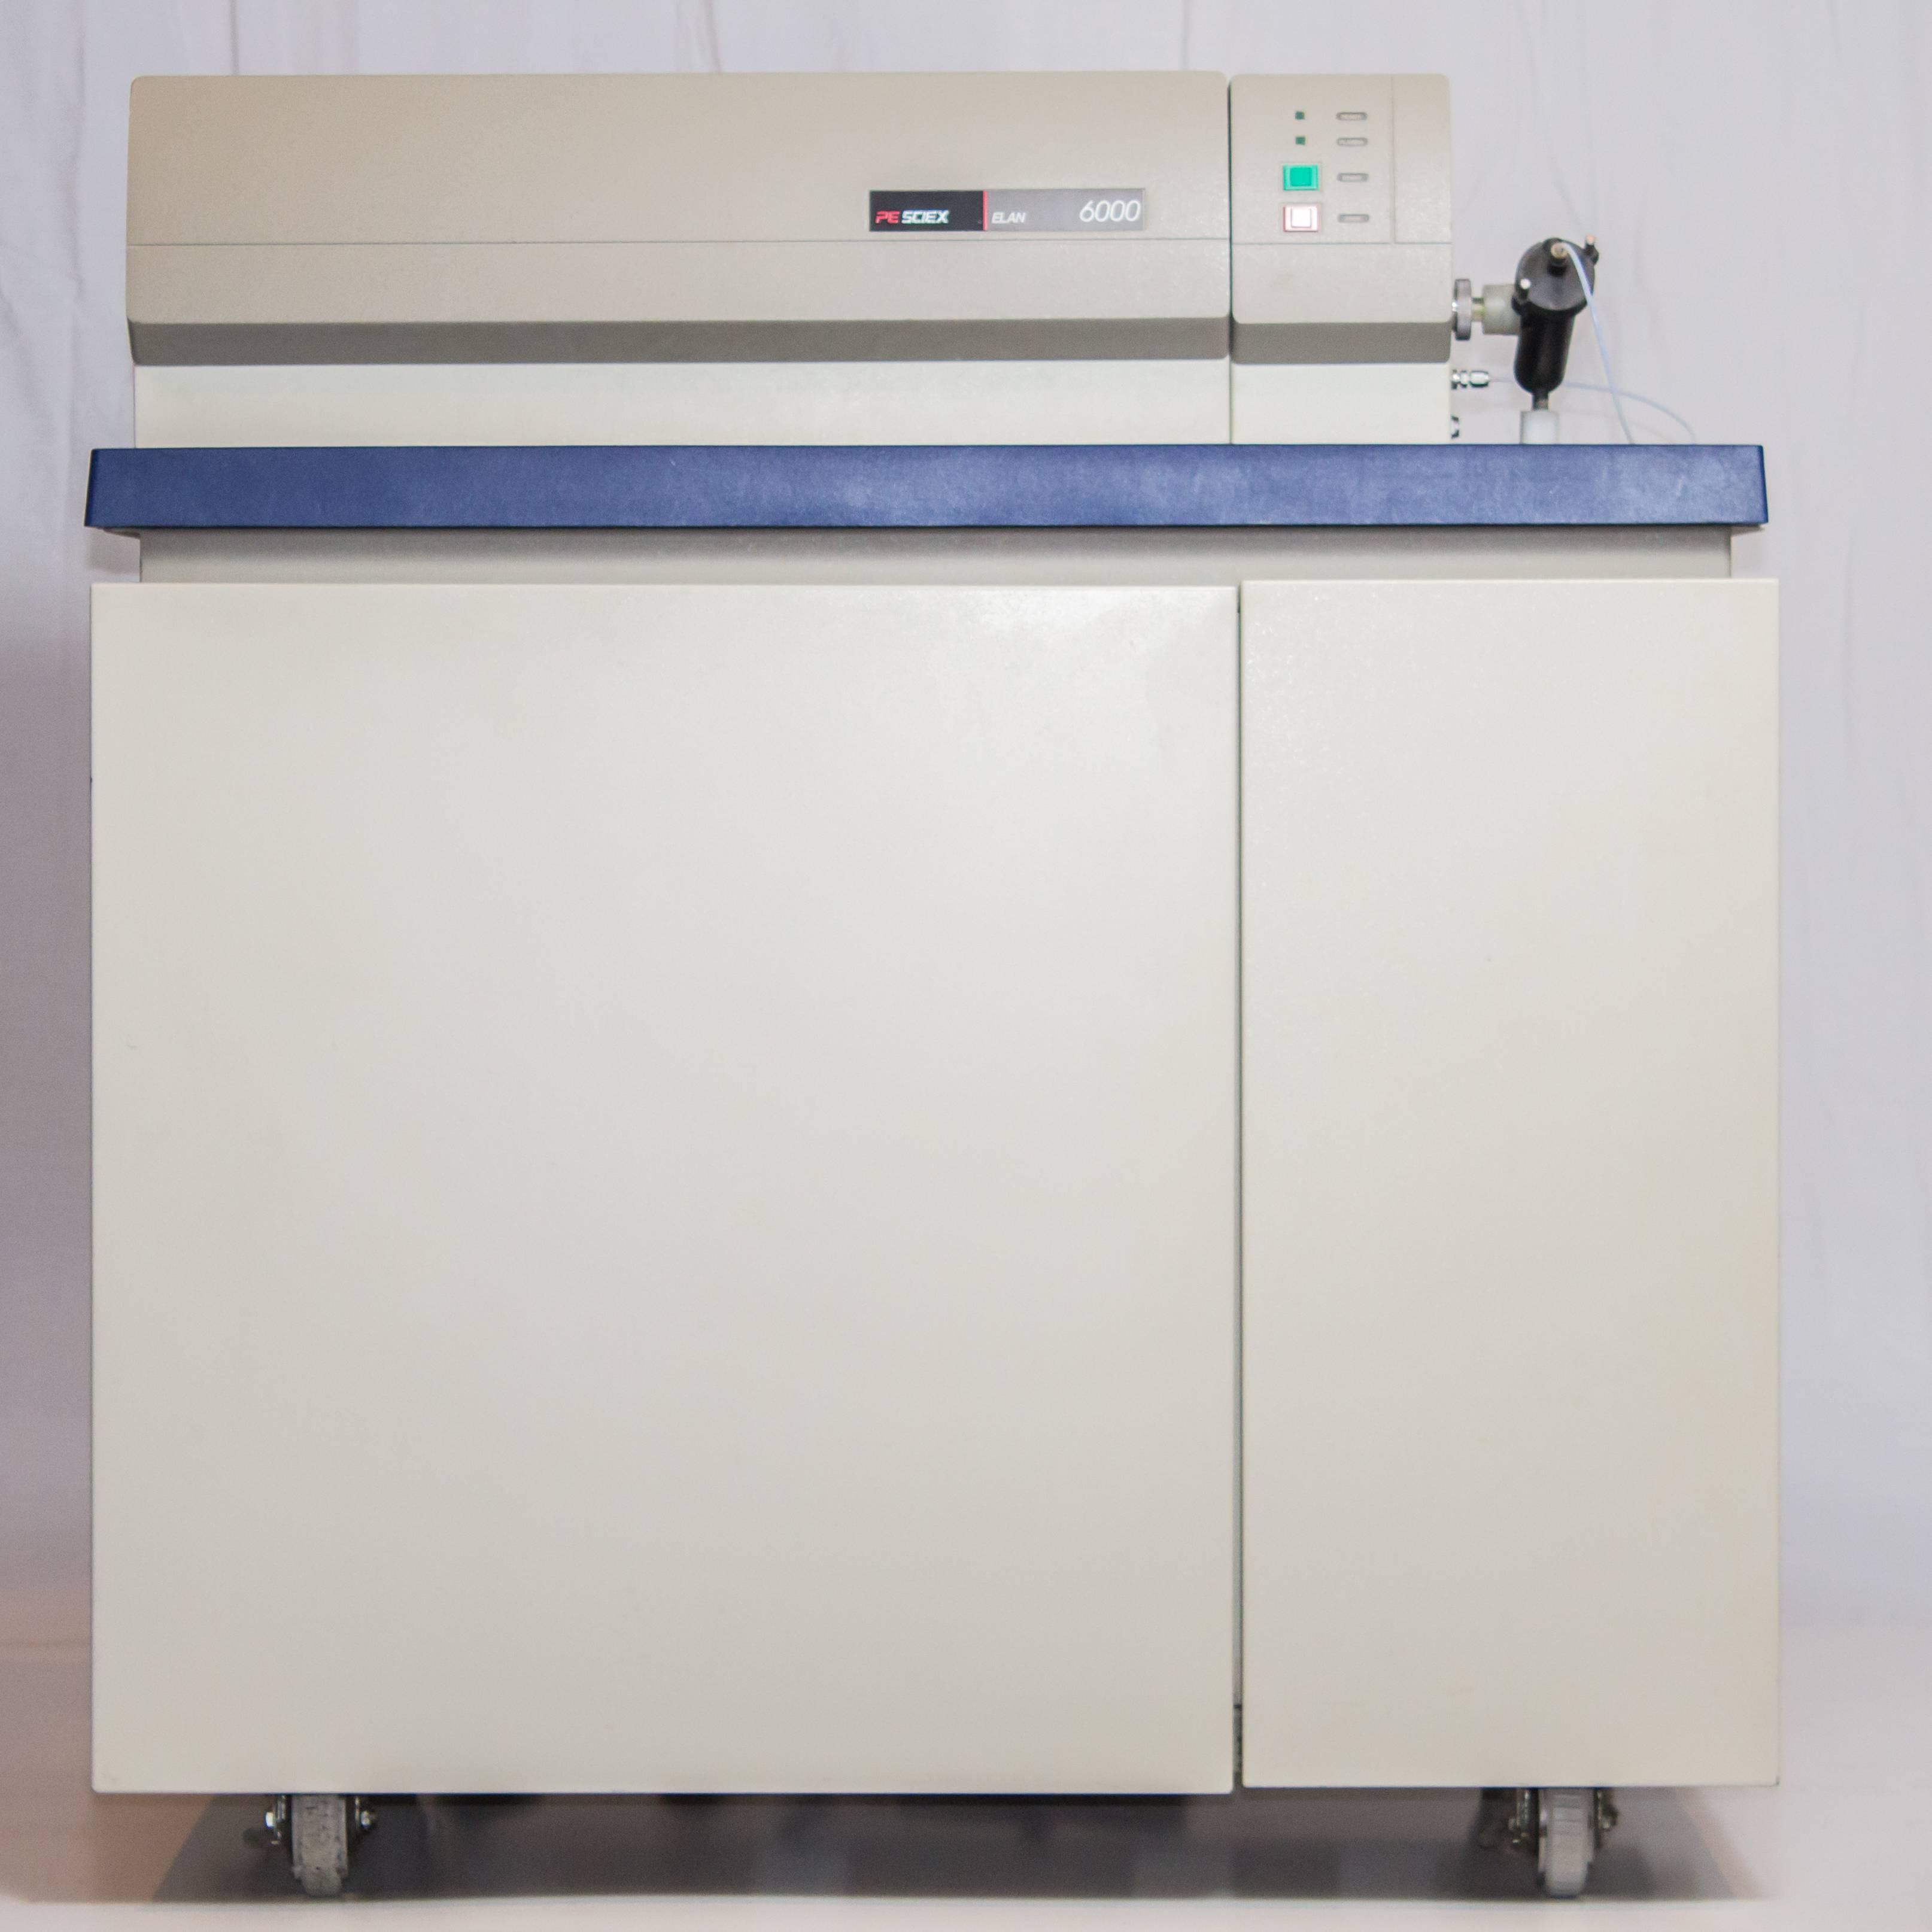 ICP-MS marca Perkin Elmer Elan 6000